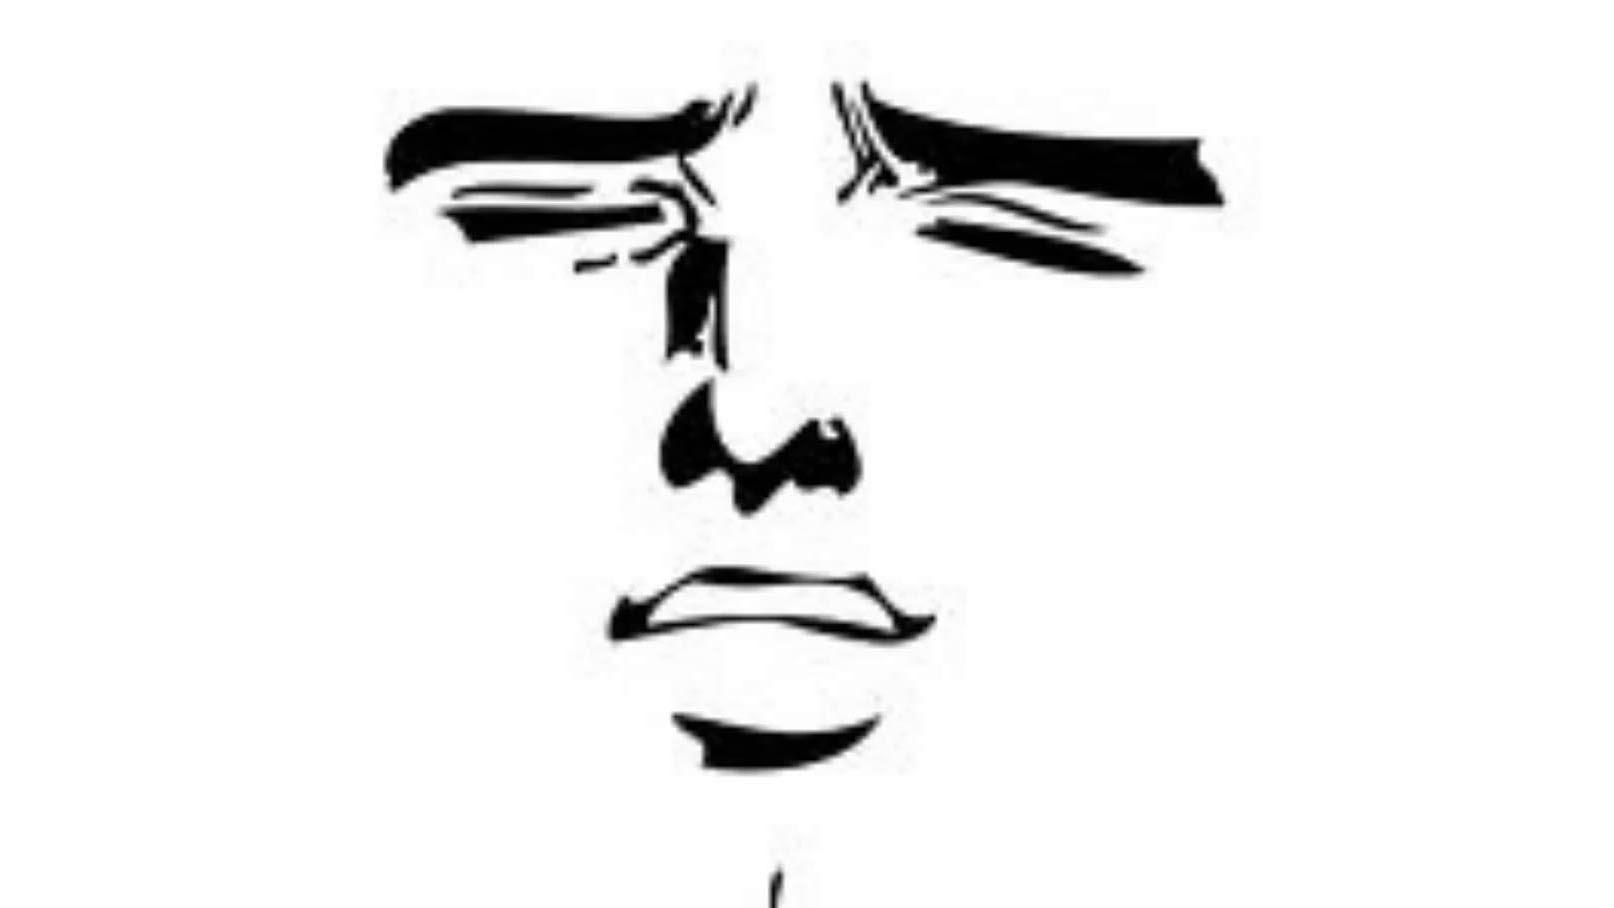 Serious Anime Face Meme Anime Faces Expressions Anime Meme Face Anime Male Face